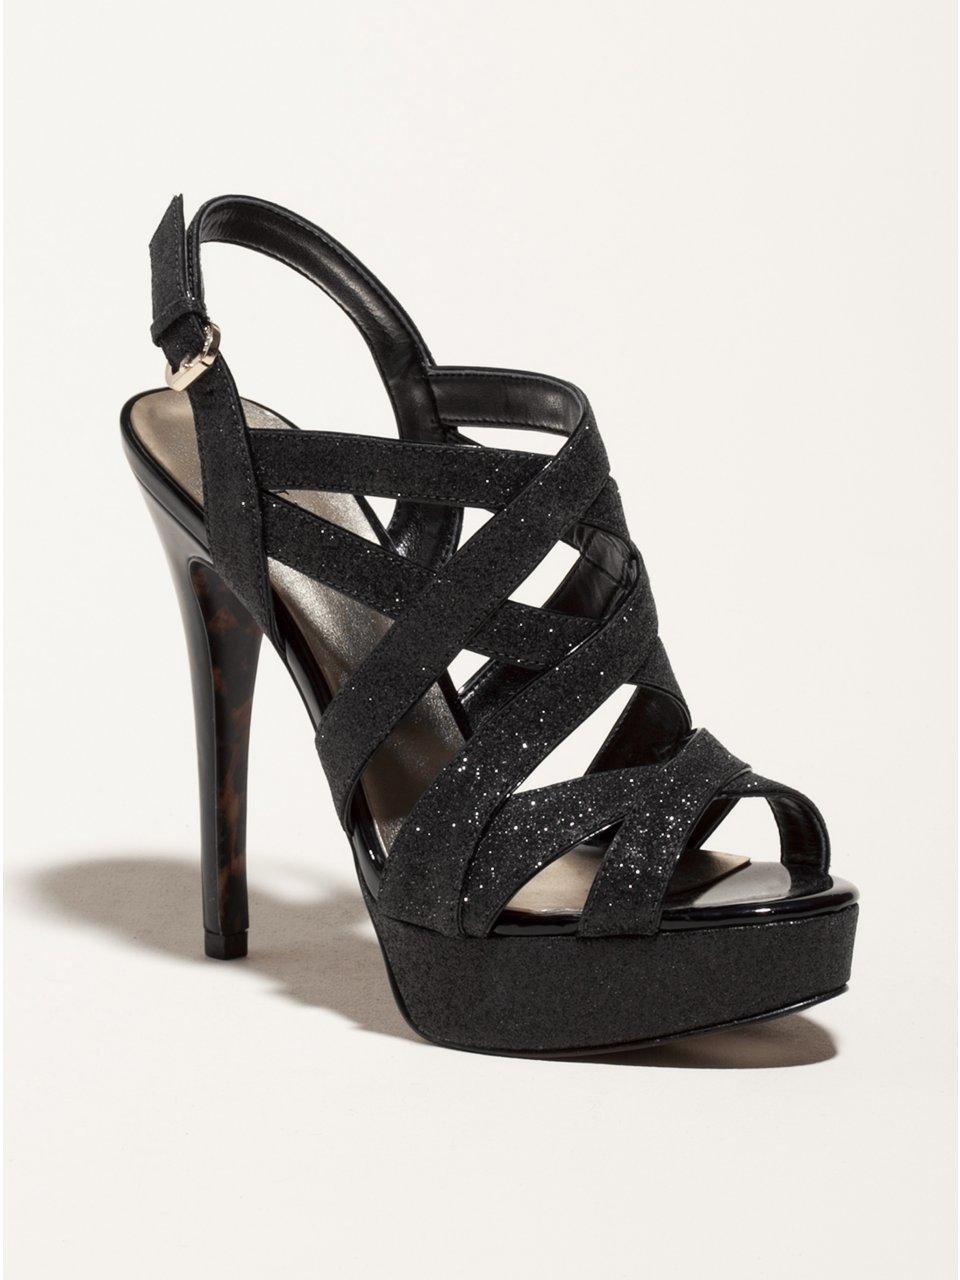 835fcf97003 GUESS Kio High Heel Sandal - Dina s Hottest Shoe s